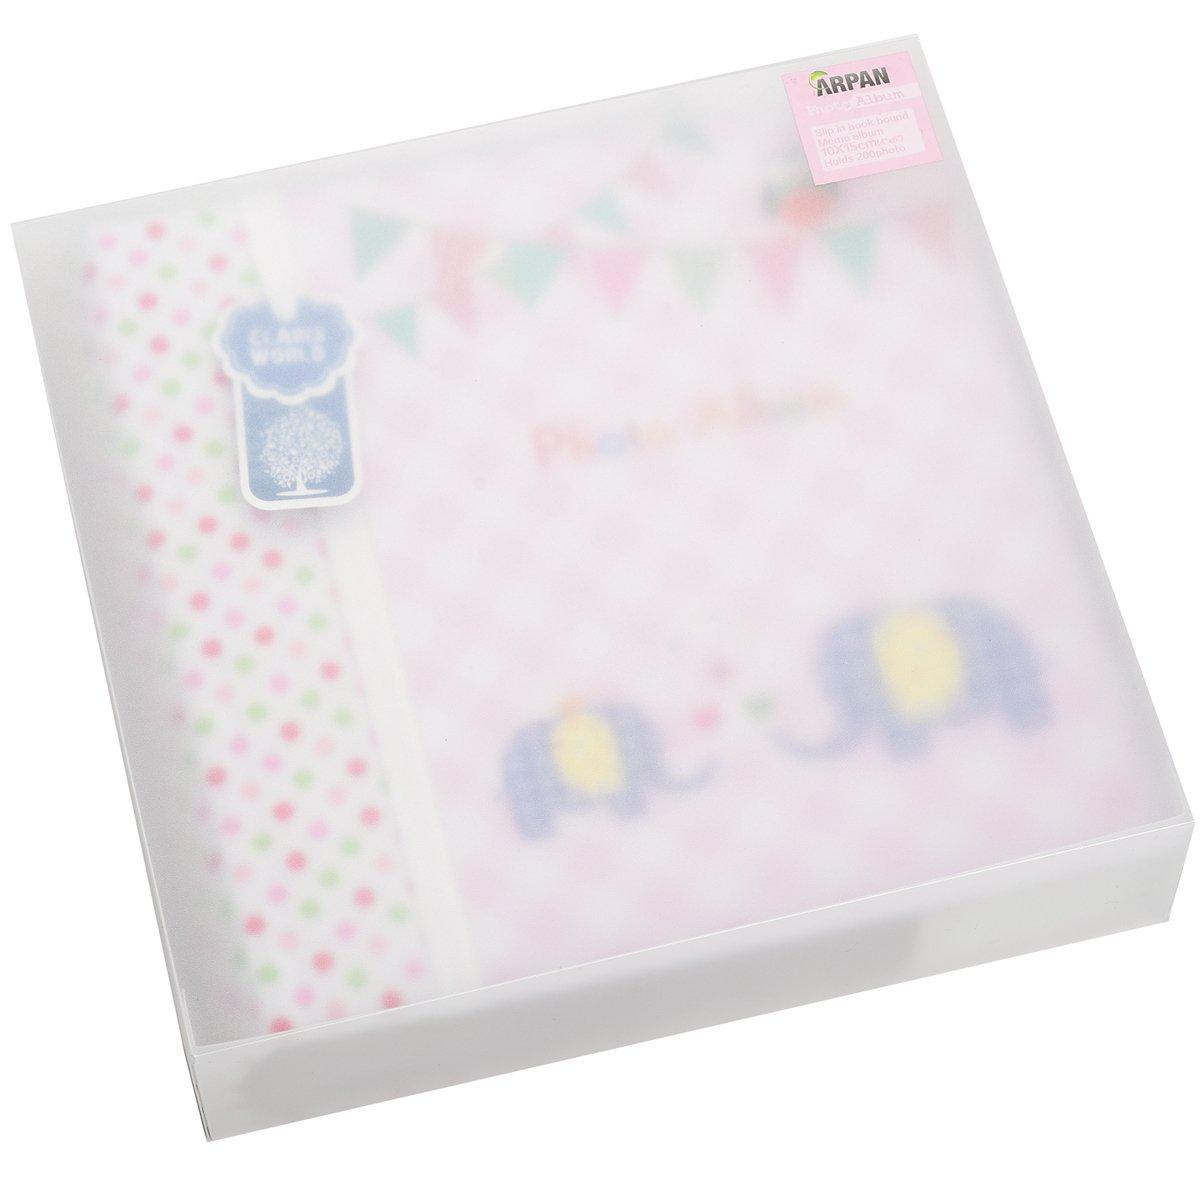 Apan Große Baby-Rosa- Memo Slip In Fotoalbum 200 6x4 '' Fotos - Elephant Kinder -Ideale Geschenk ARPAN BA-9857